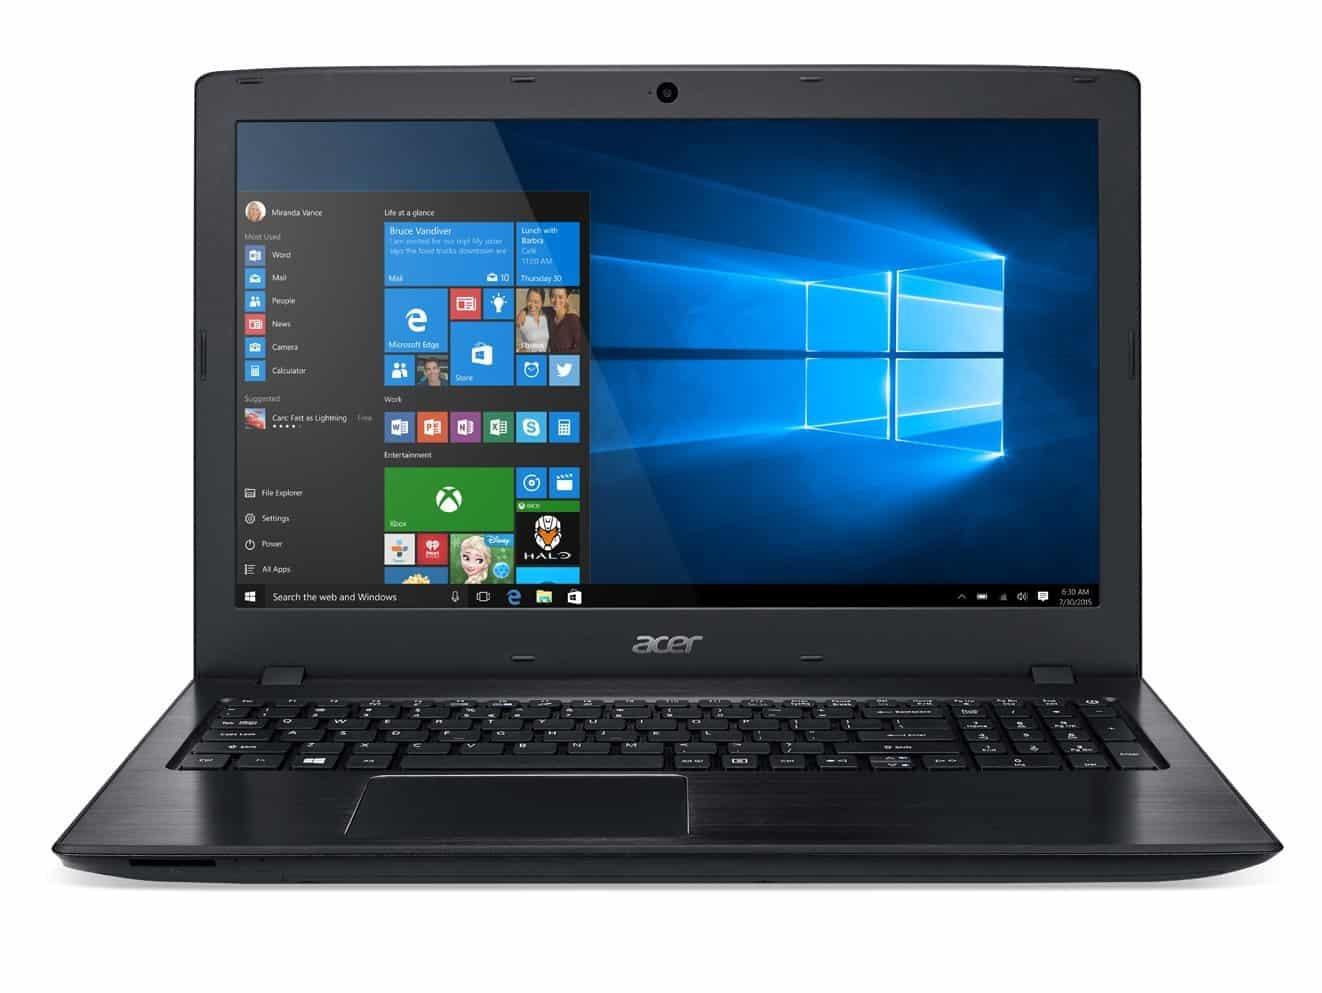 The $400 Acer Aspire E15 Laptop